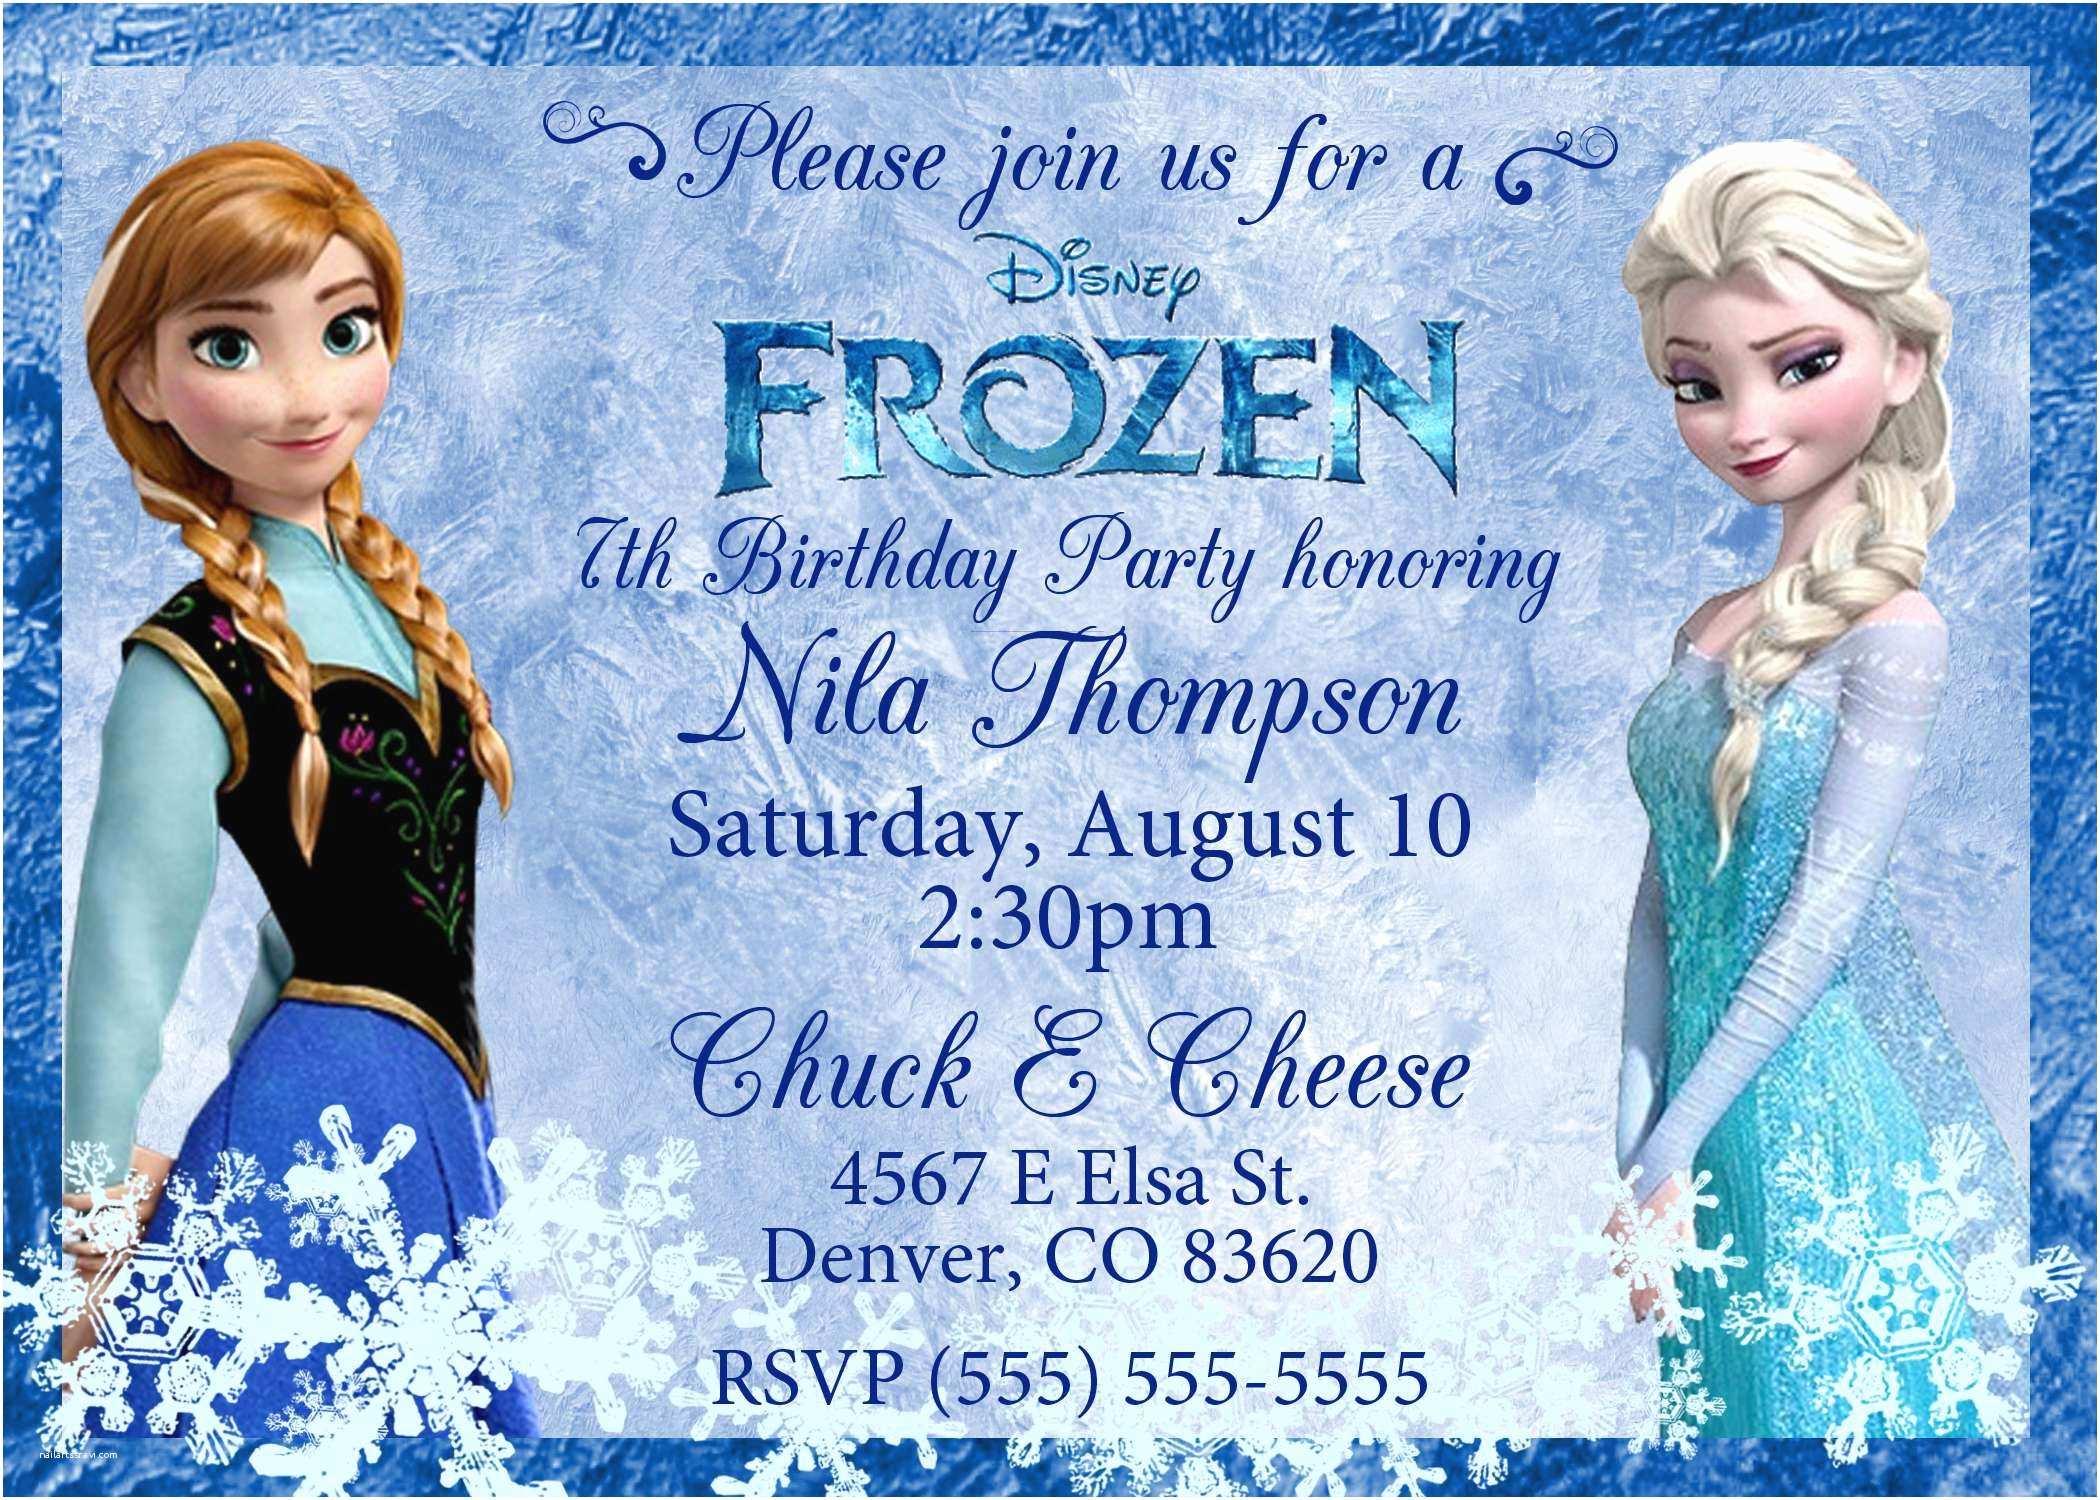 Disney Frozen Personalized Invitations